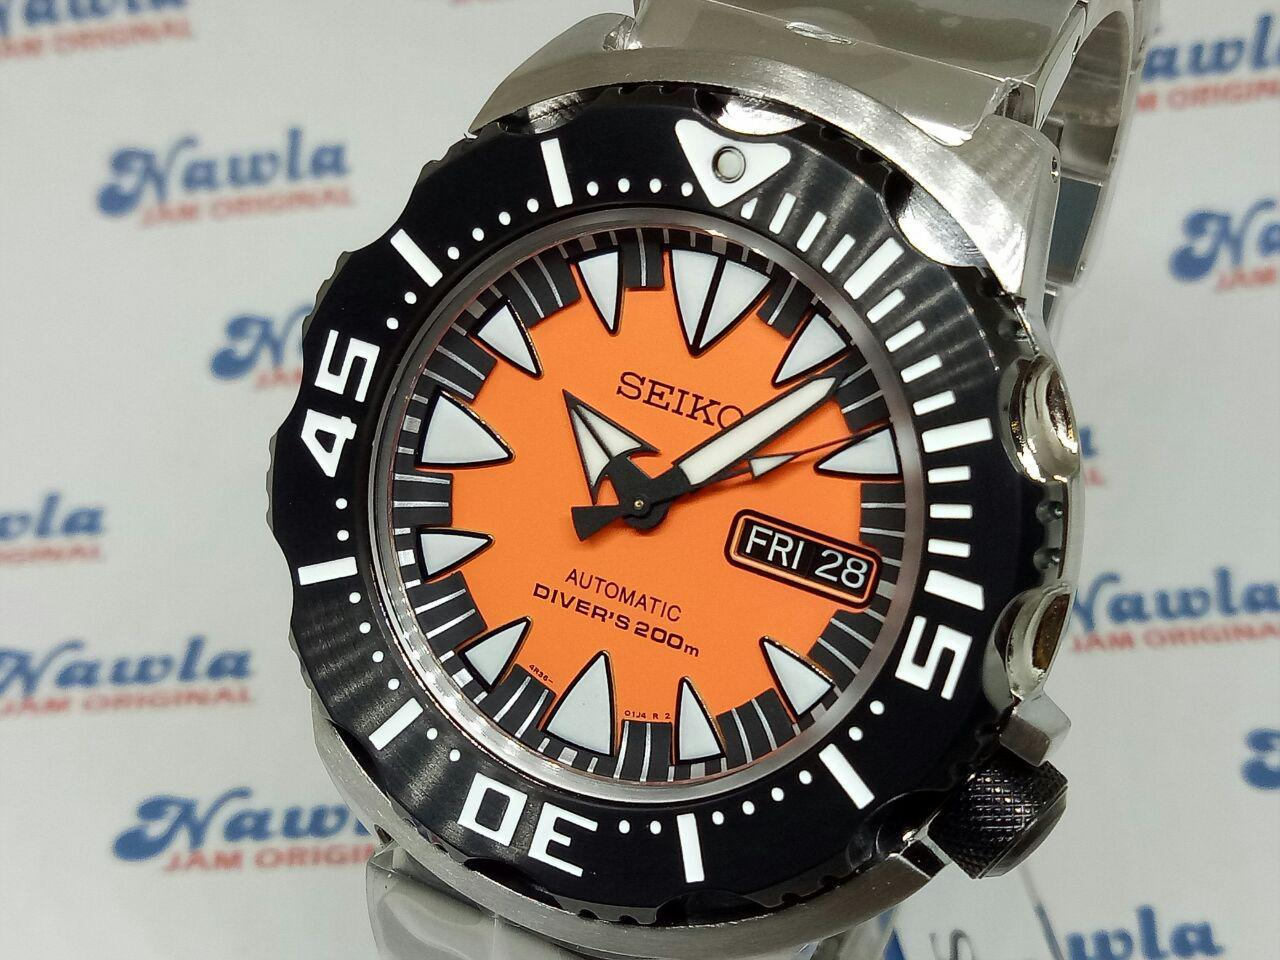 Seiko Male Orange Dial Silver Strap Srp483k1 Intl Daftar Harga Chronograph Jam Tangan Stainless Steel Sks521p1 Automatic Srp315k2 Monster Diver Pria Srp315 3